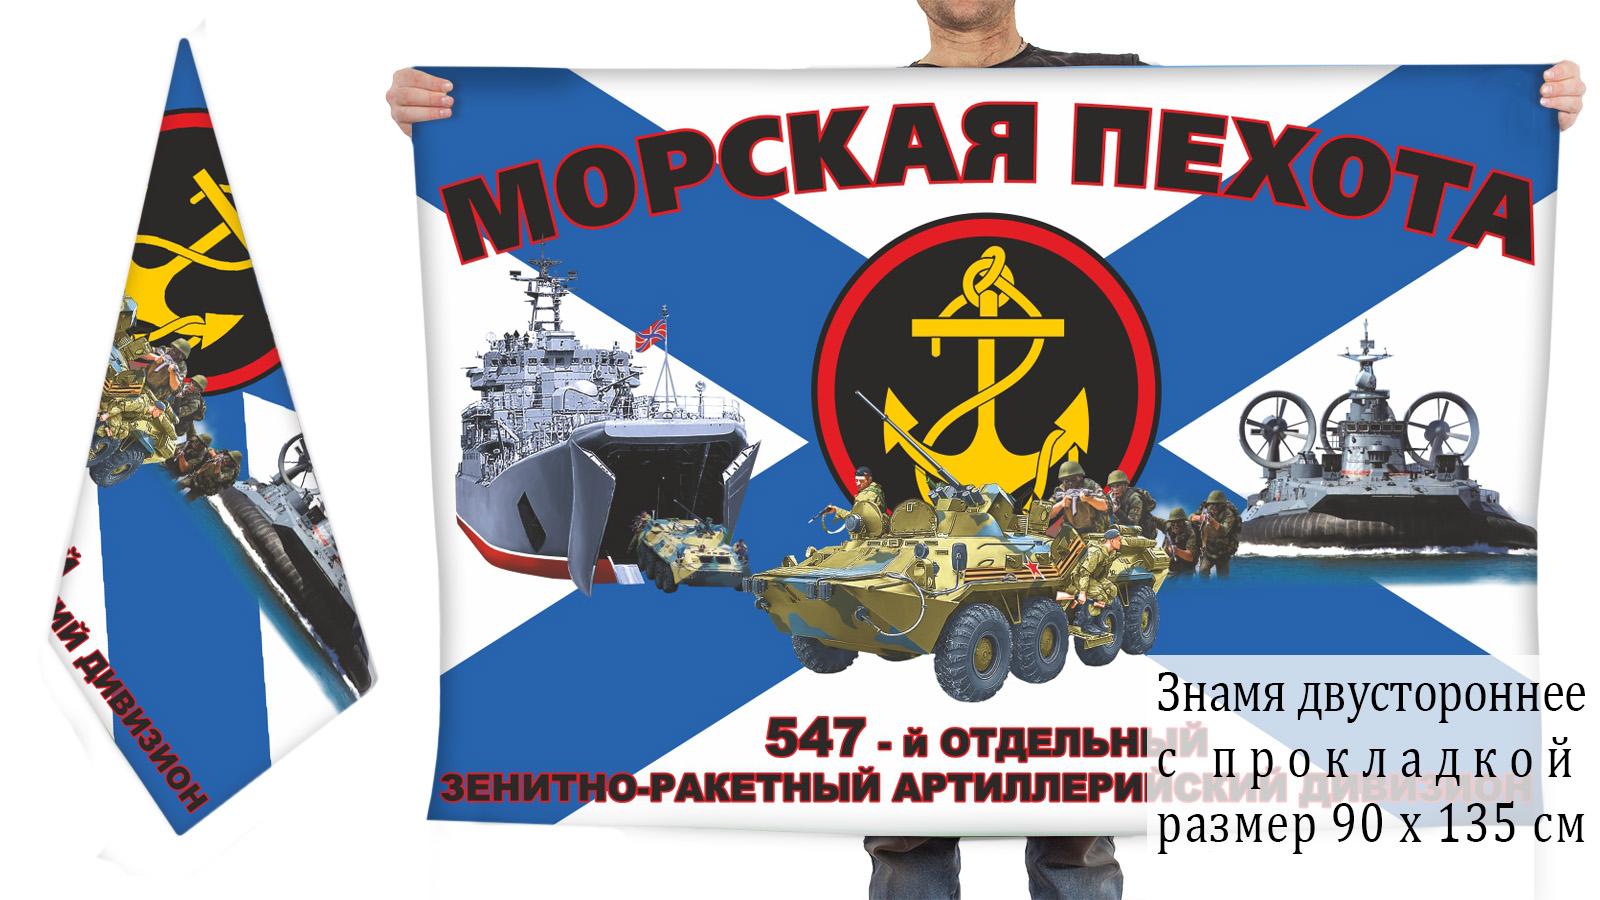 Двусторонний флаг 547 отдельного зенитно-ракетного артиллерийского дивизиона морпехов